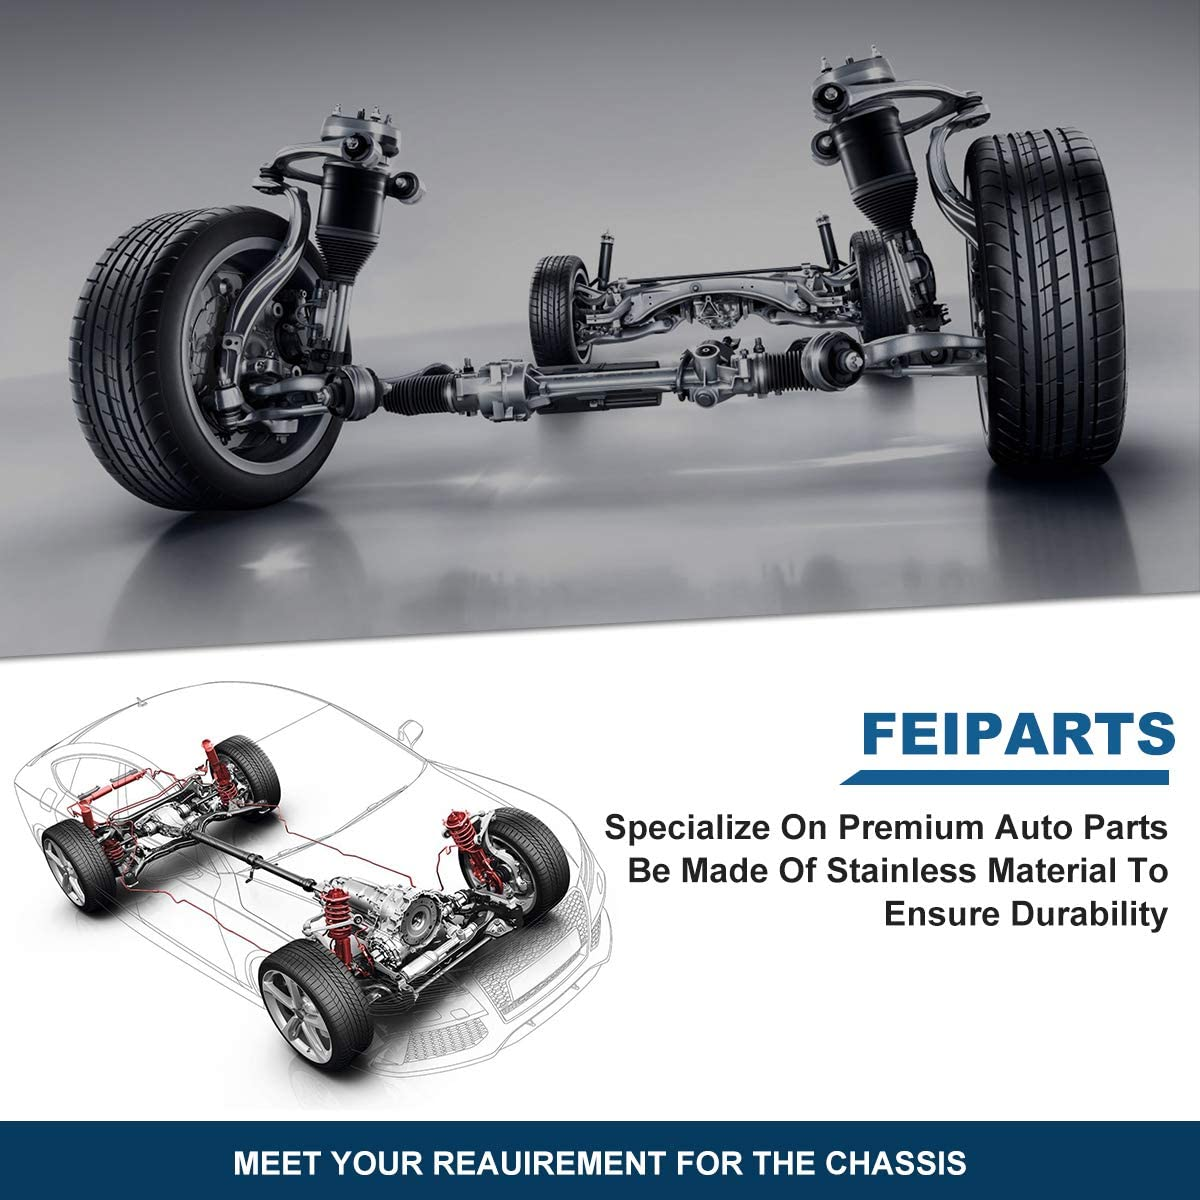 FEIPARTS Suspension Parts Sway Bar Link Kit Rear Sway Bar End Links Rear Sway Bar End Links 2001 2002 2003 2004 2005 For EL 2001 2002 2003 2004 2005 For Honda Civic